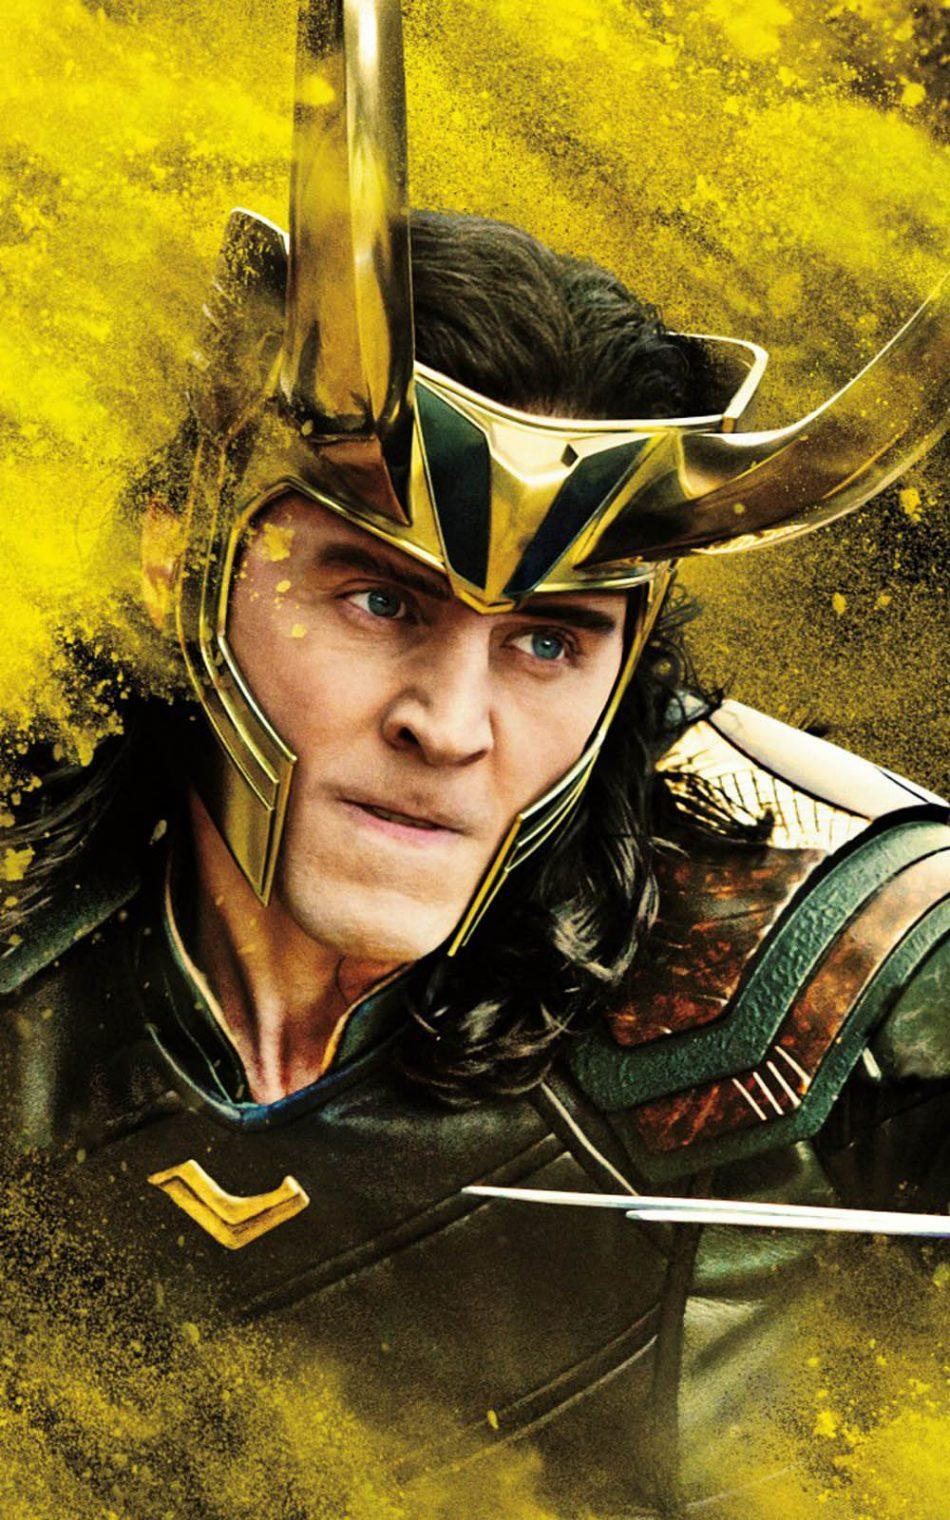 Download Tom Hiddleston In Thor Ragnarok Movie Free Pure 4k Ultra Hd